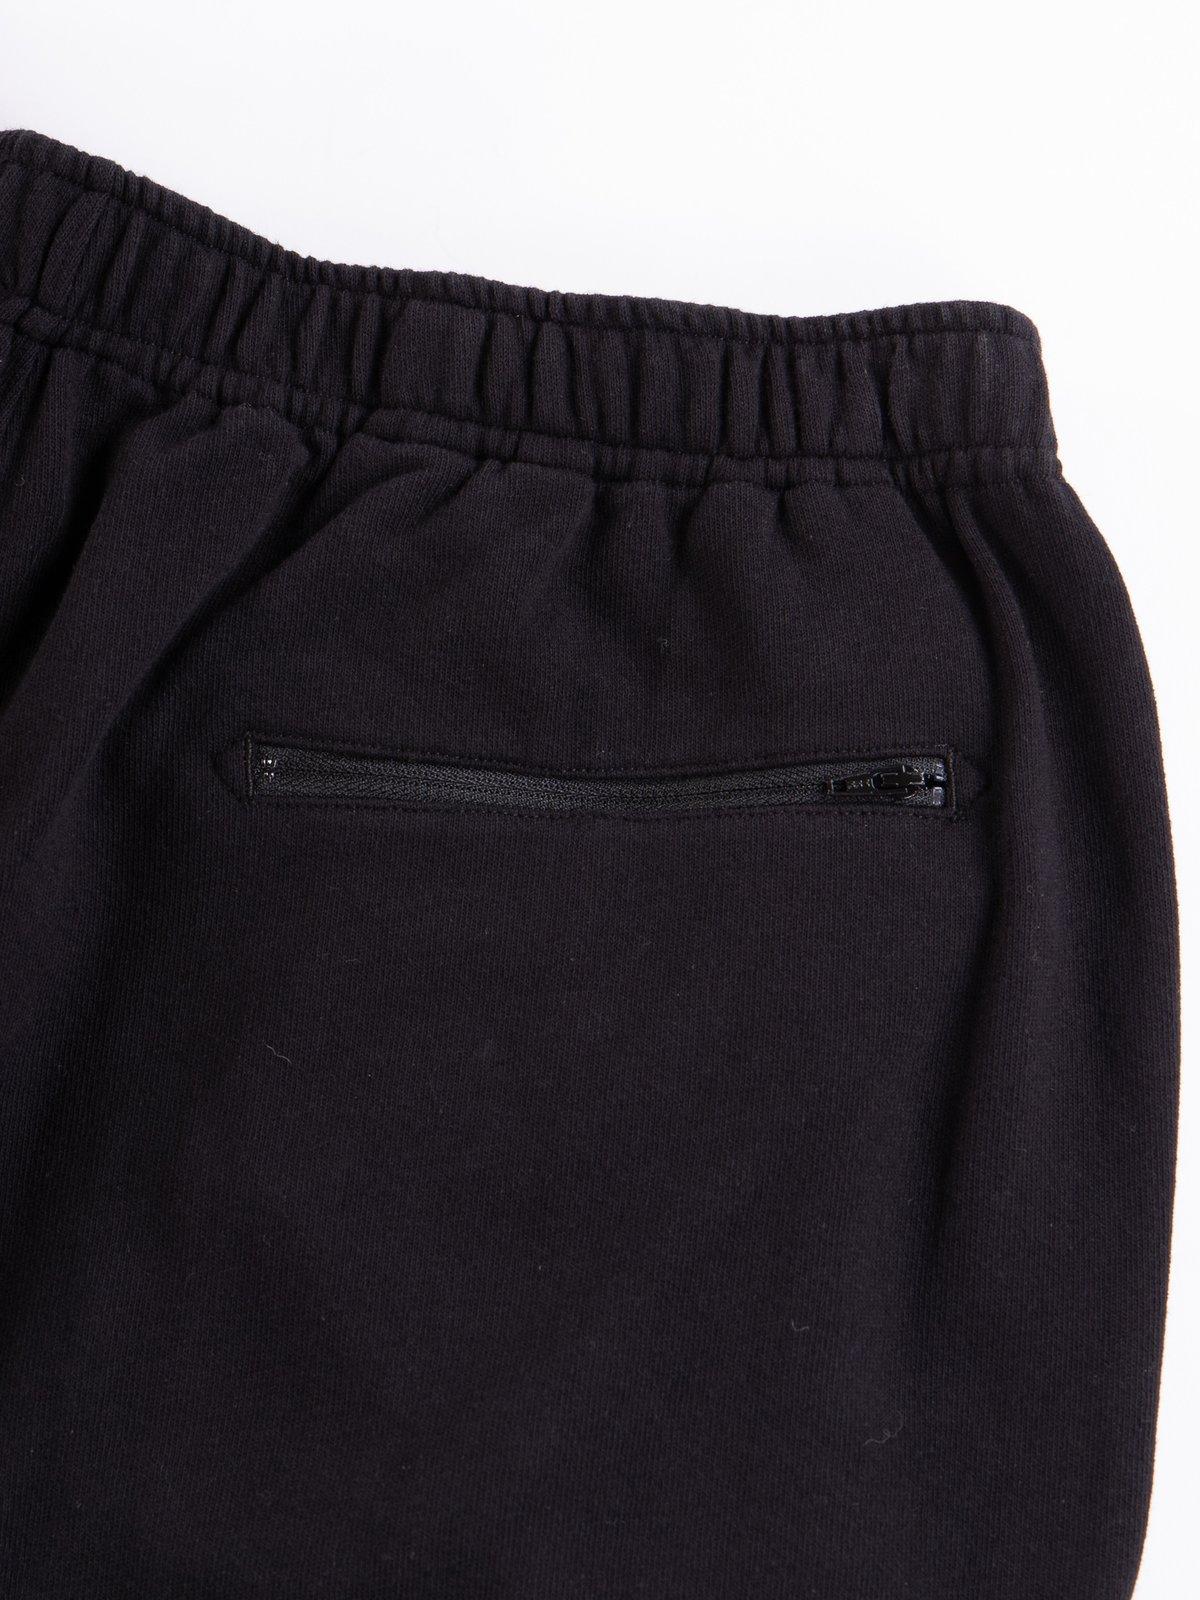 Black Jog Pant - Image 6